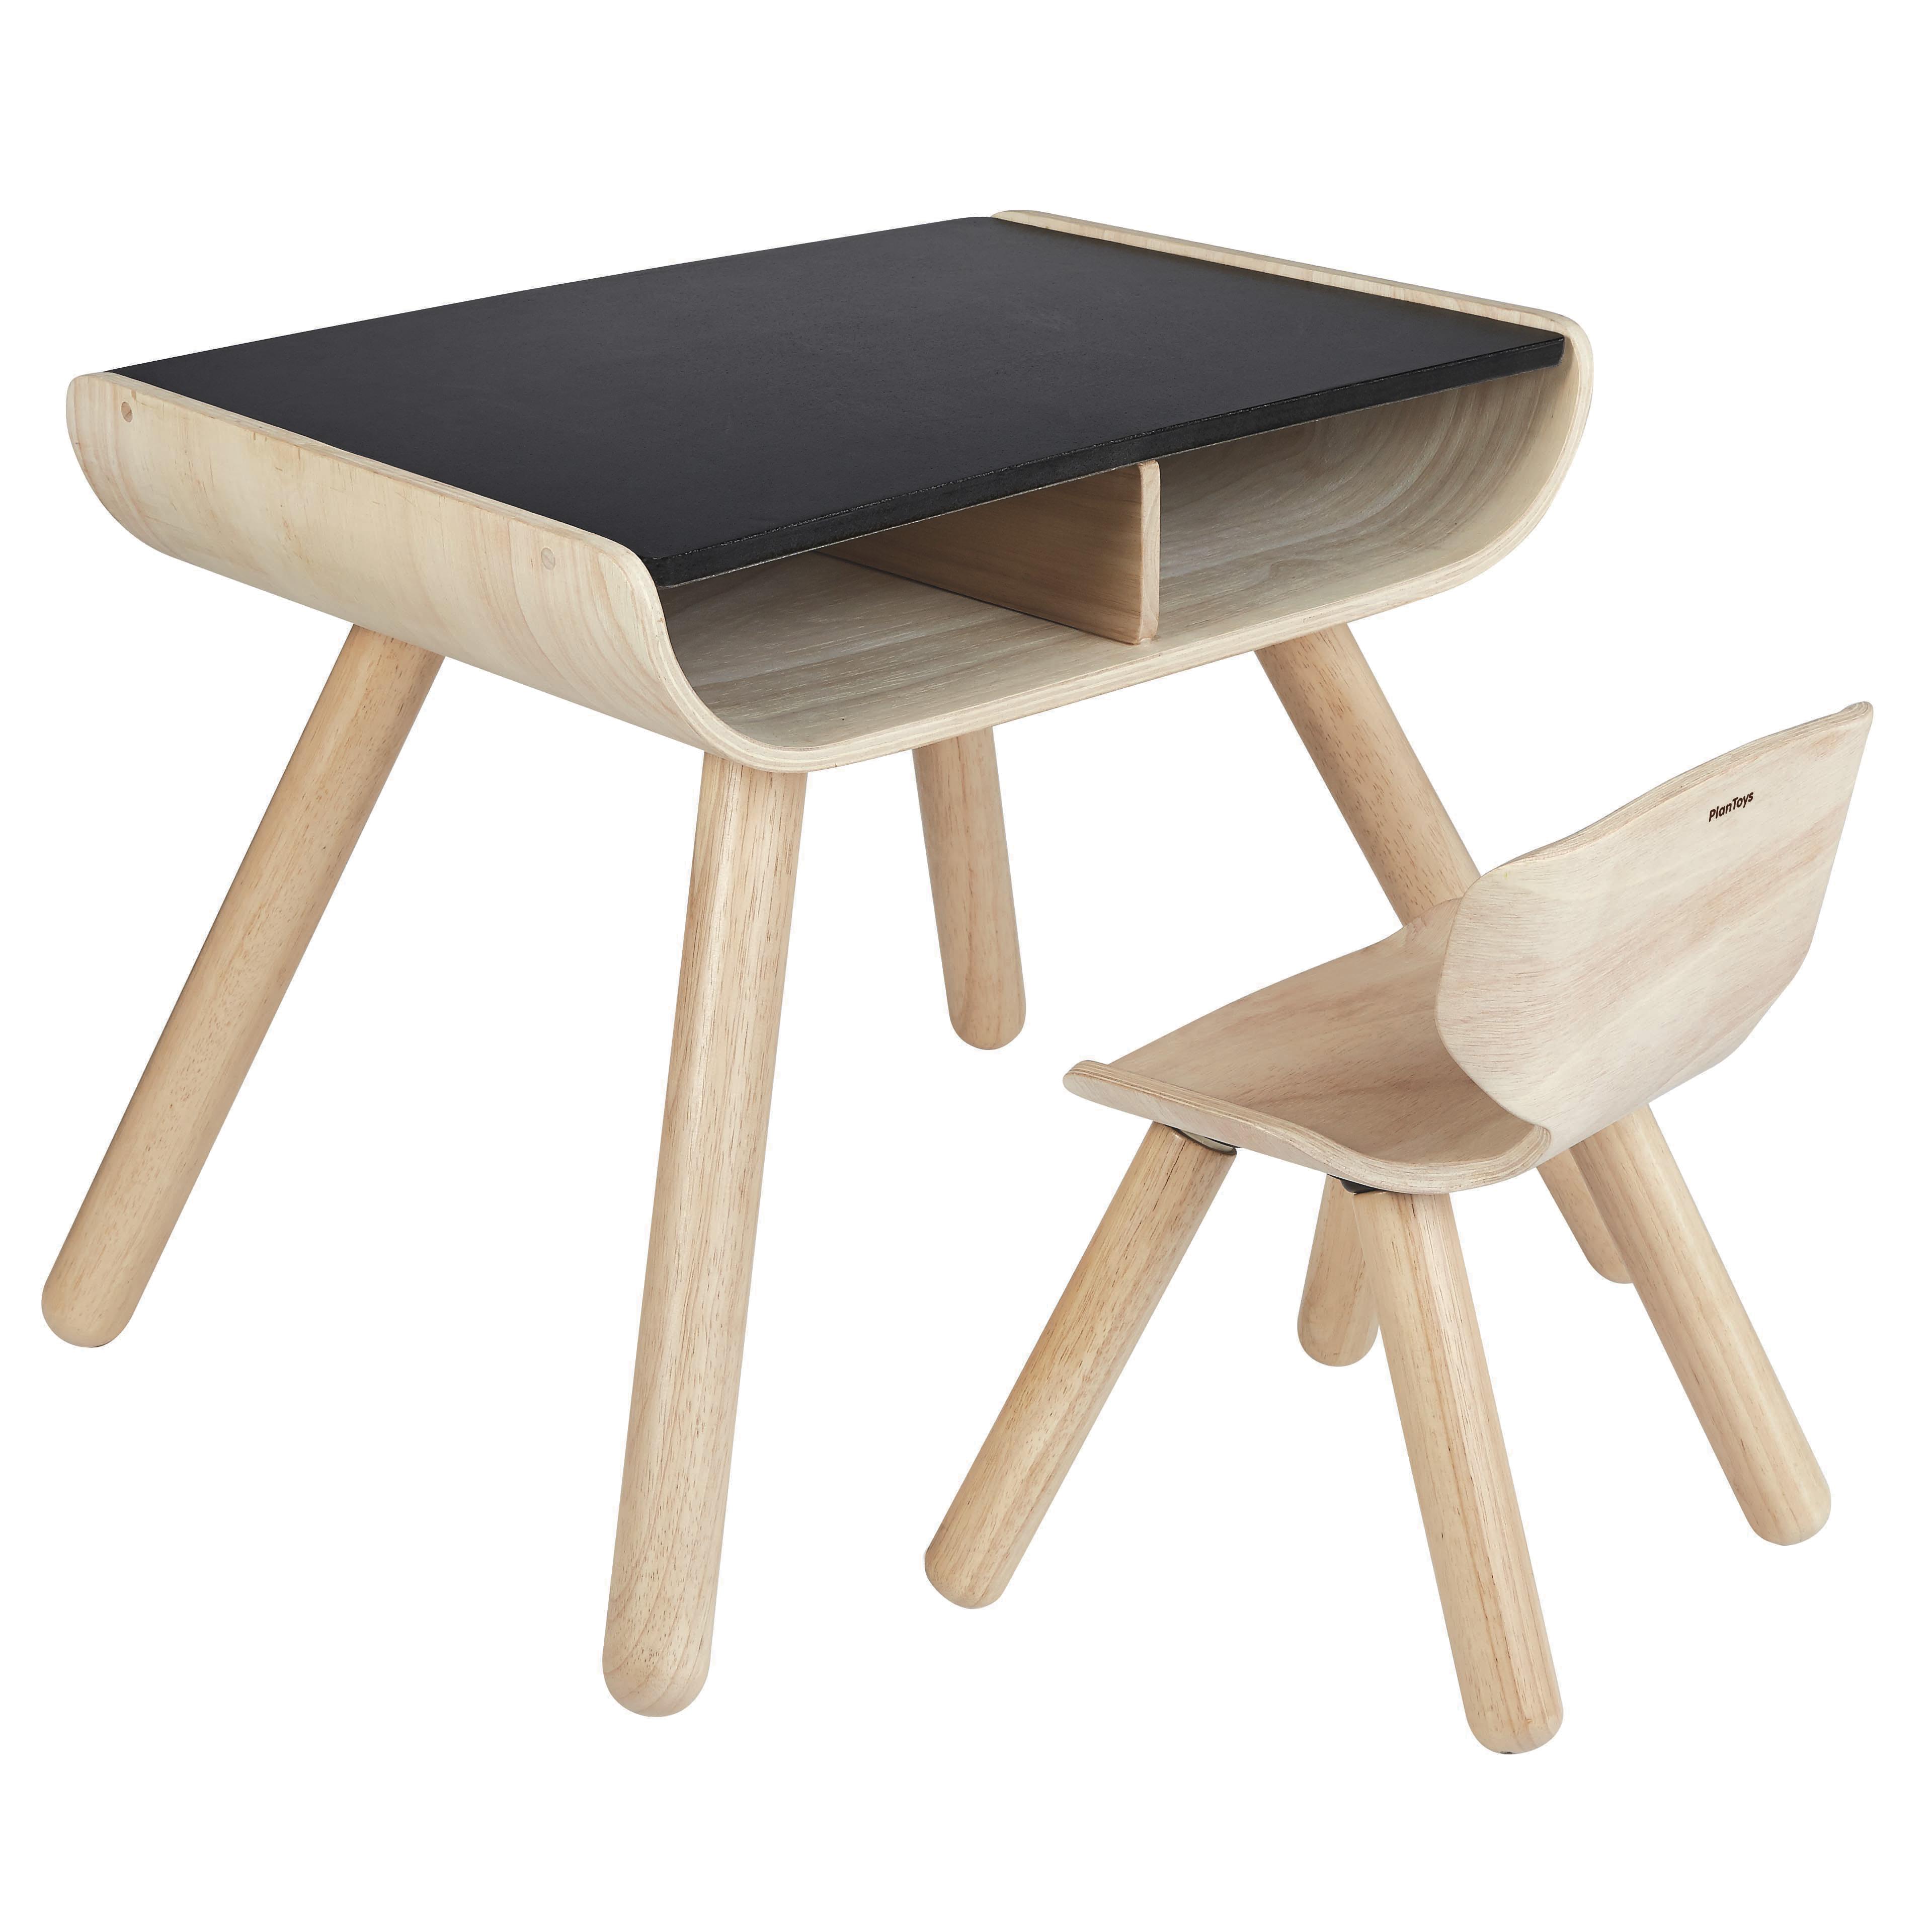 Image of   Plantoys stol og bord - Natur/sort